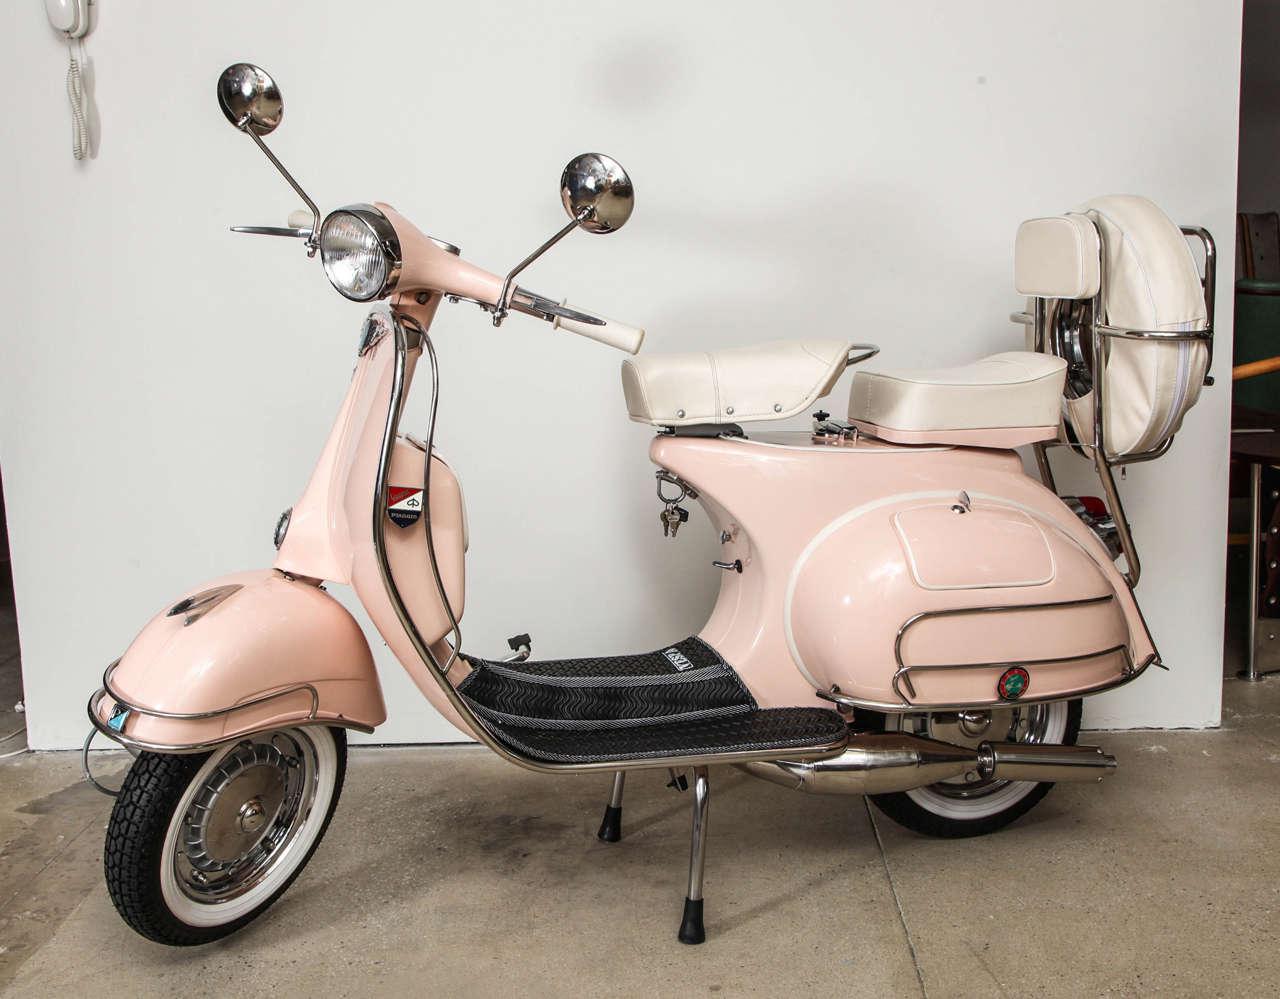 vintage italian scooter - HD1280×999